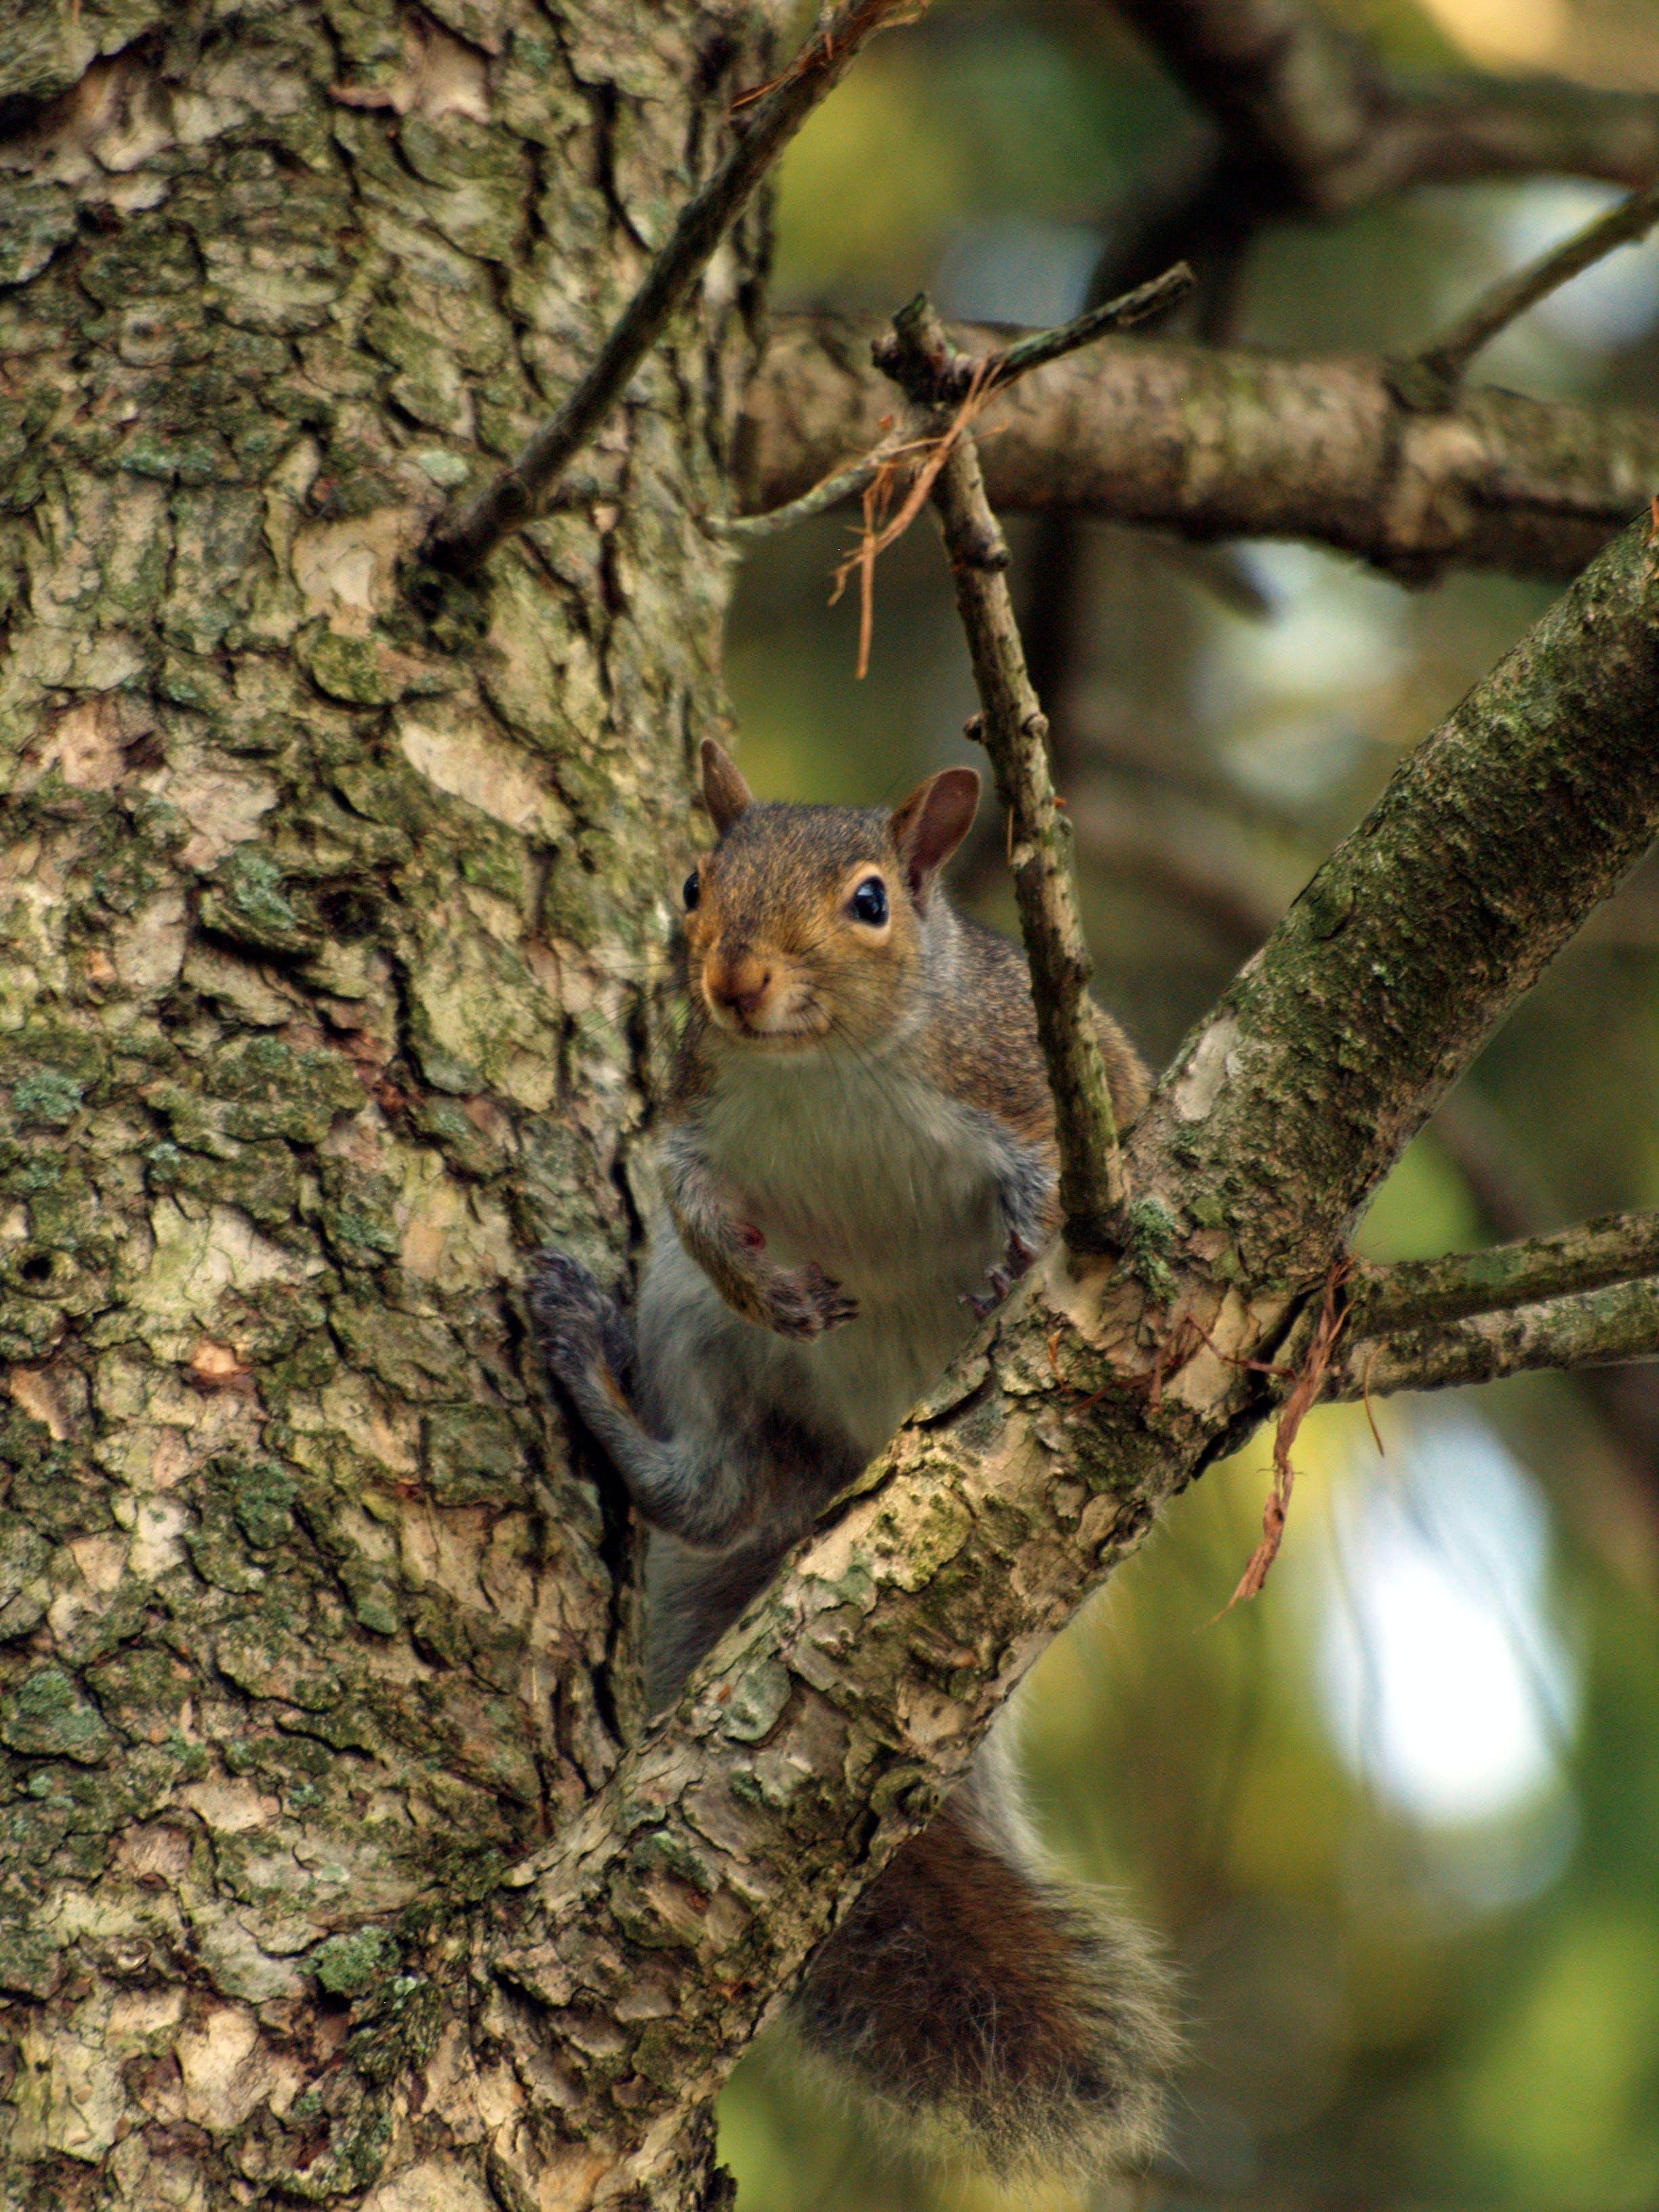 Free stock photo of animals, nature, squirrel, trees